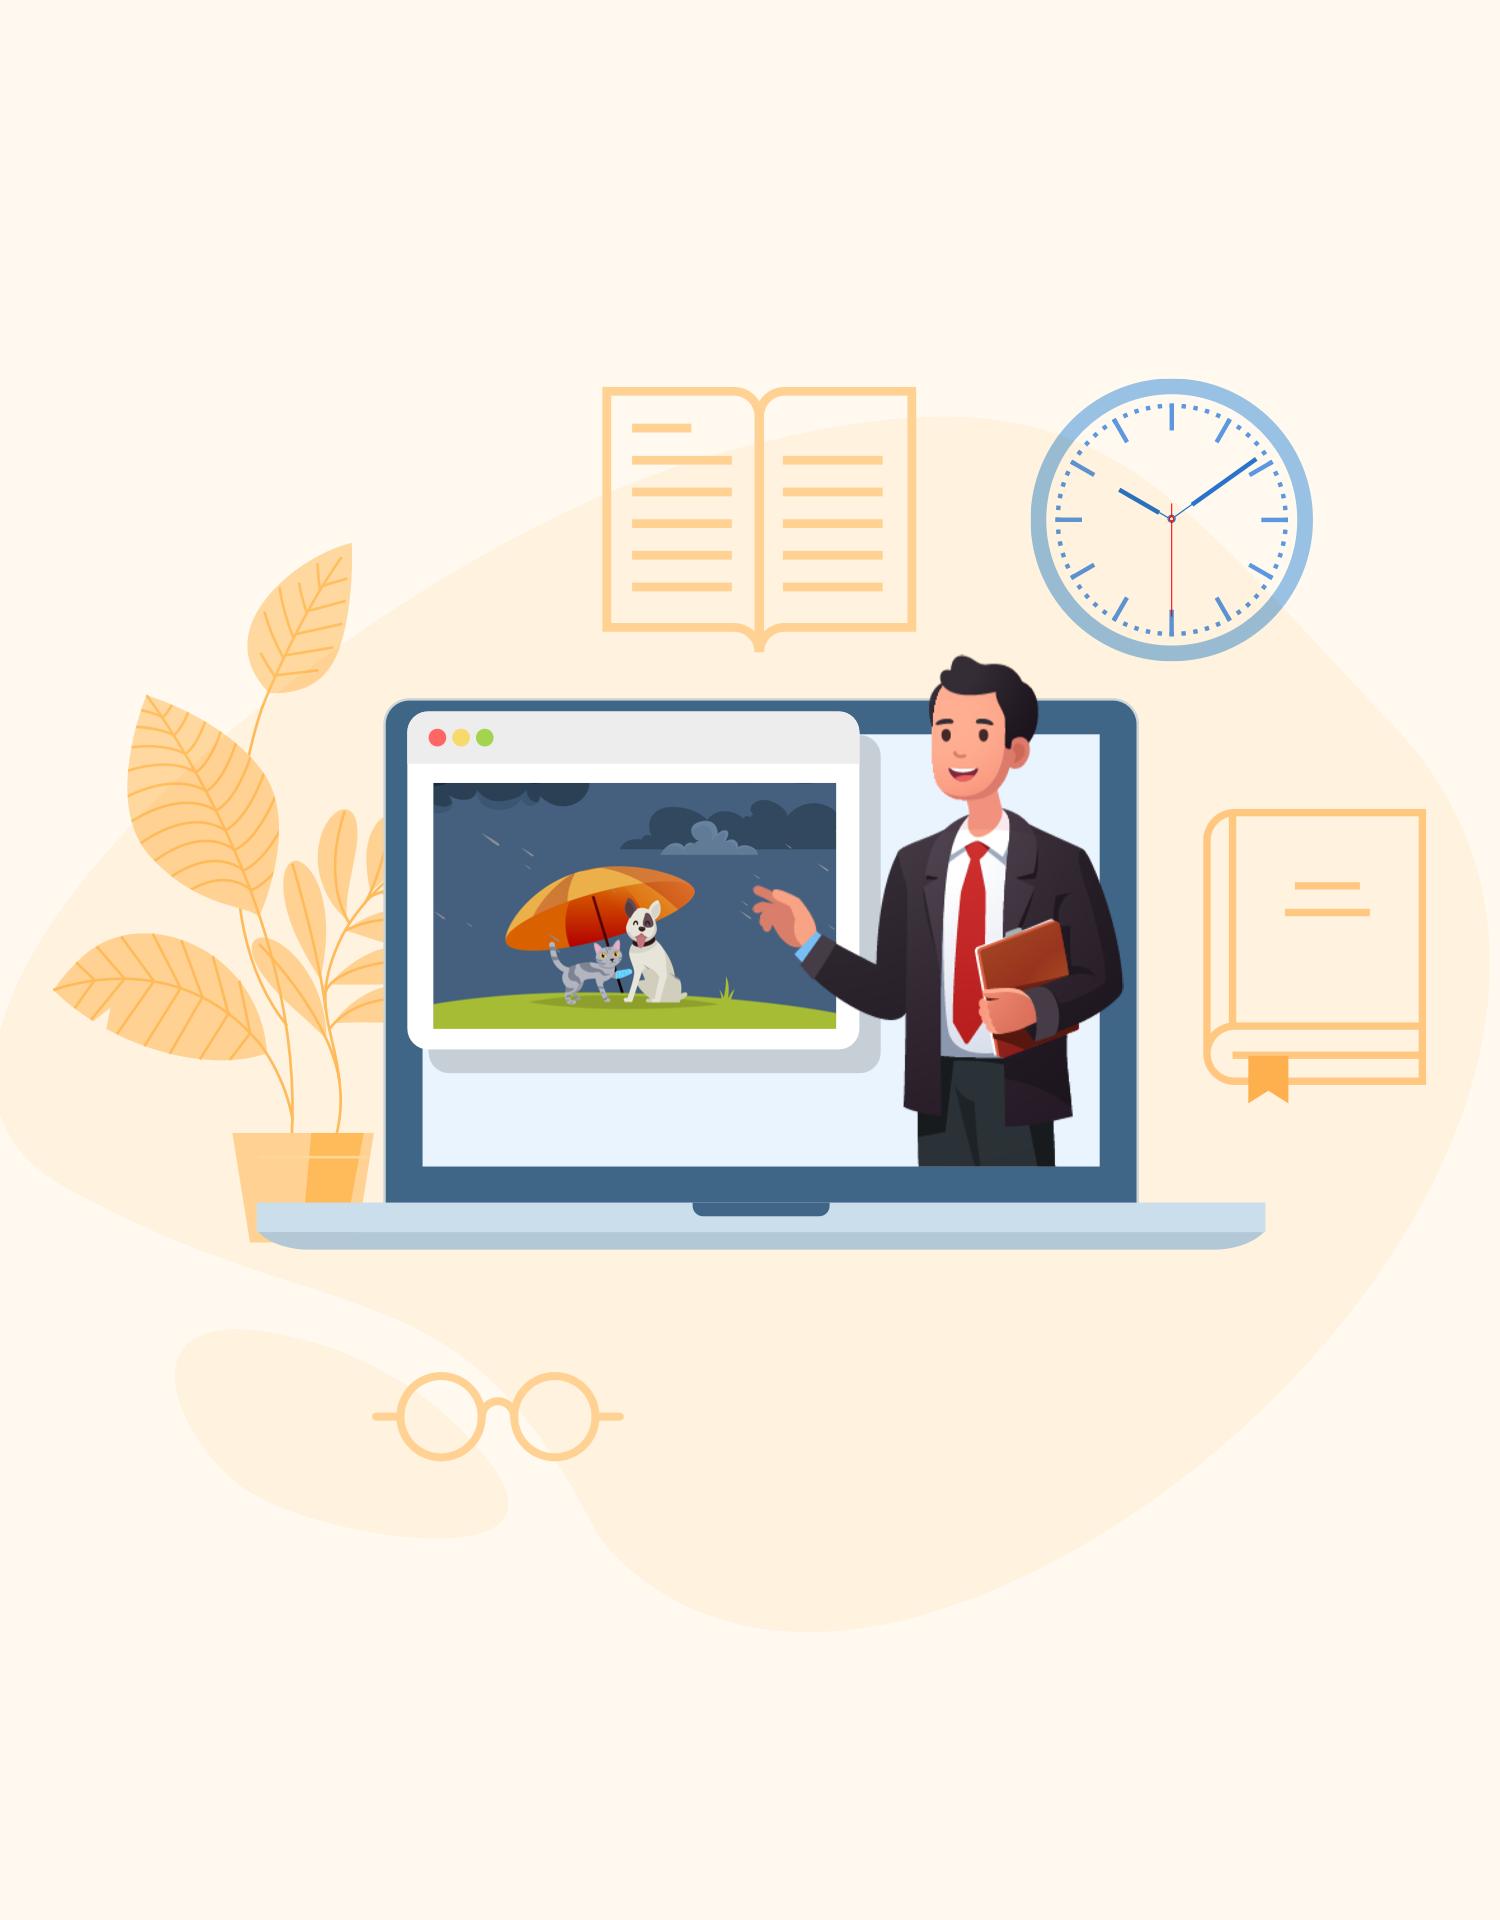 A free online webinar that helps veterinary staff learn about pet insurance.